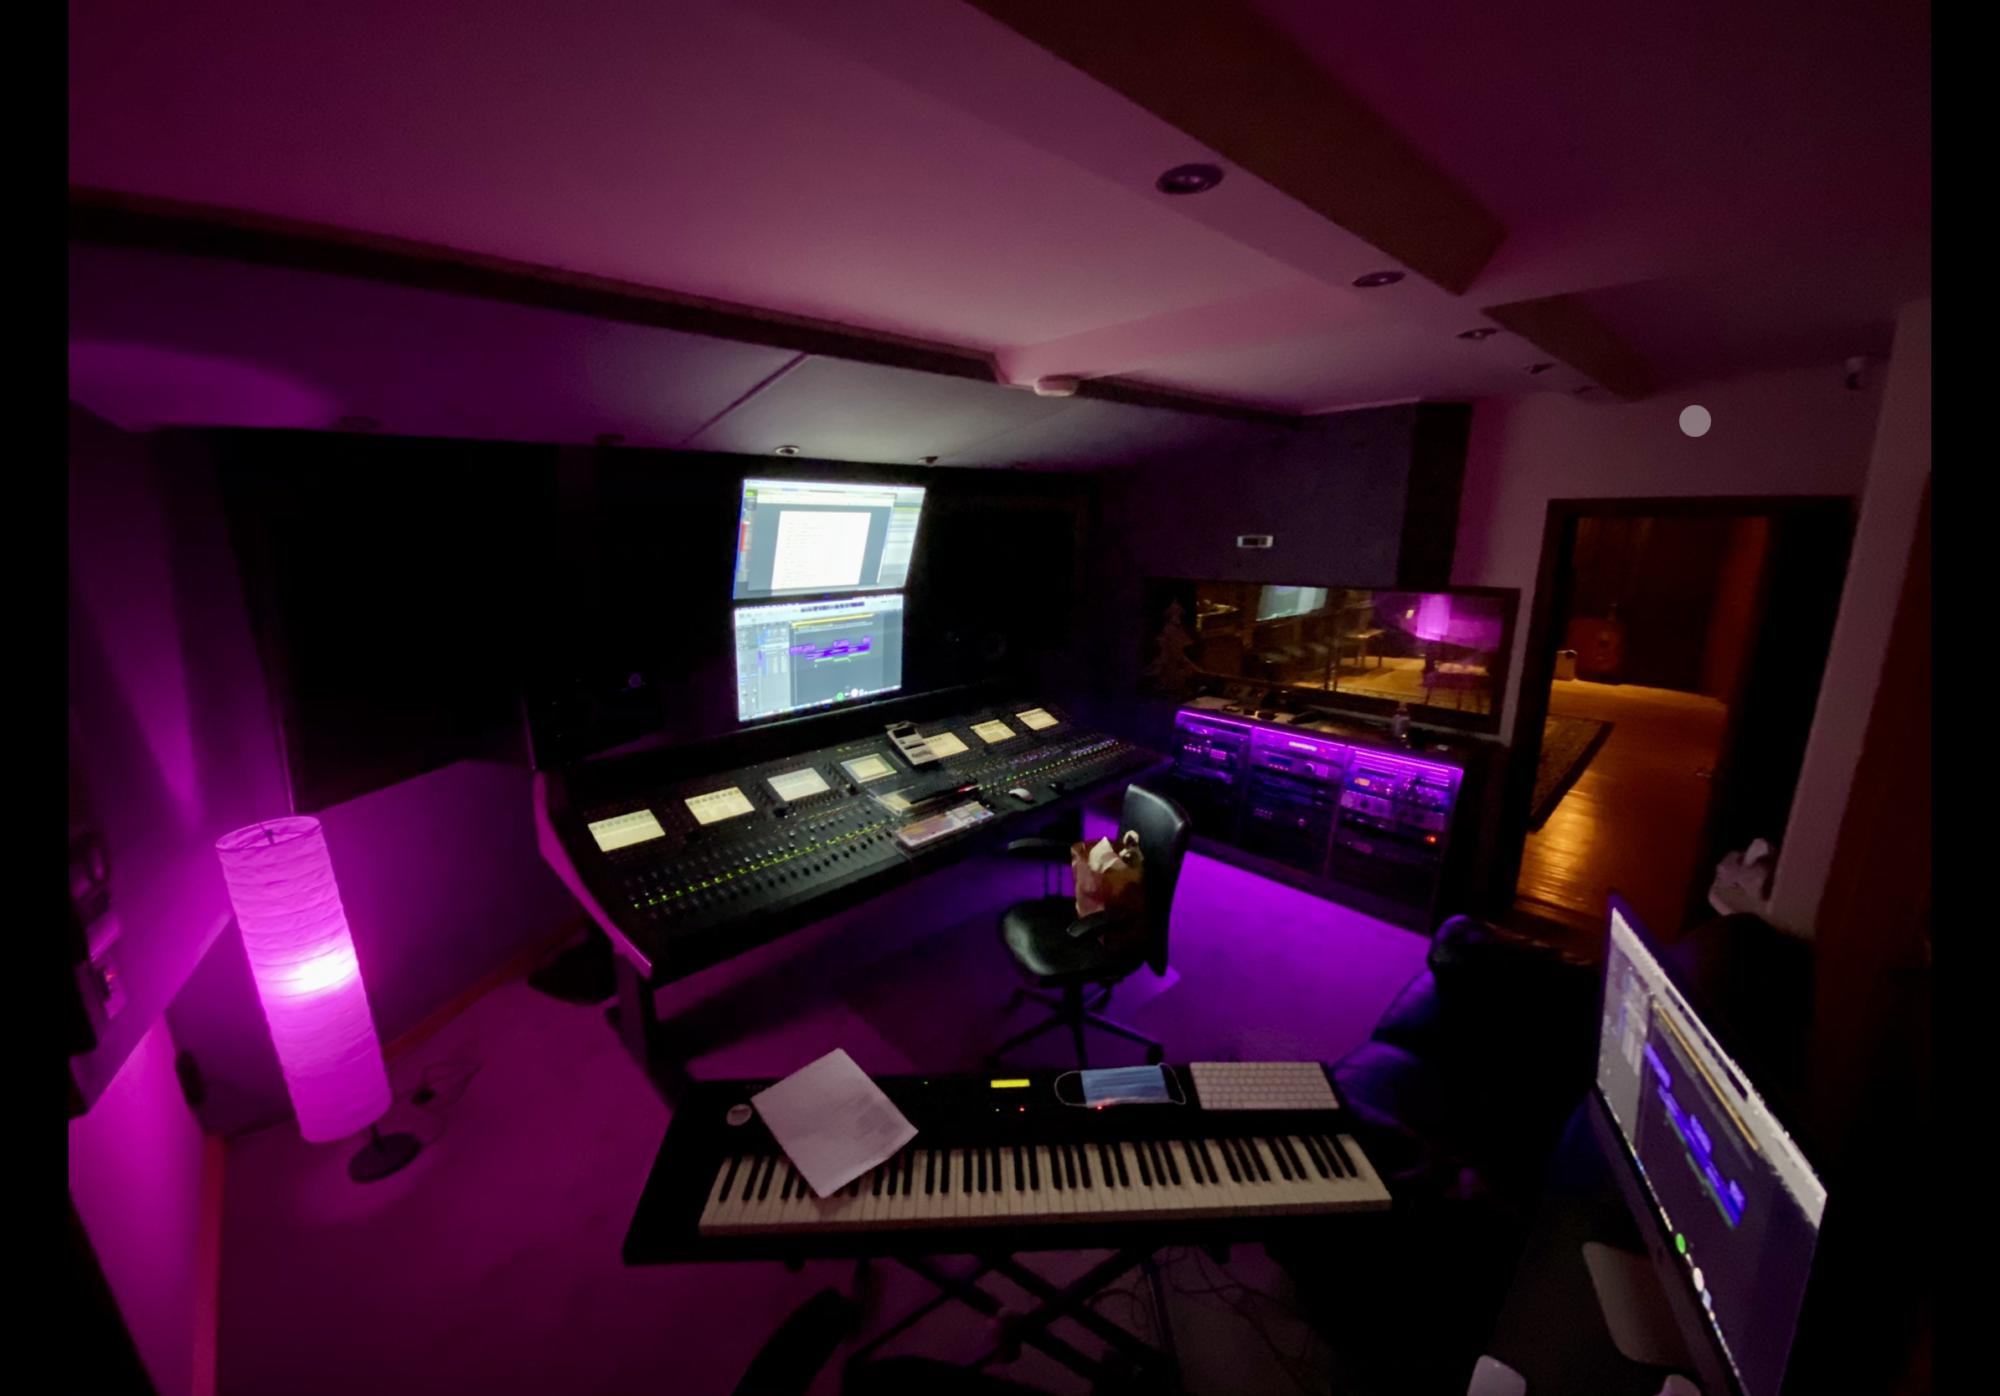 Vox Studios